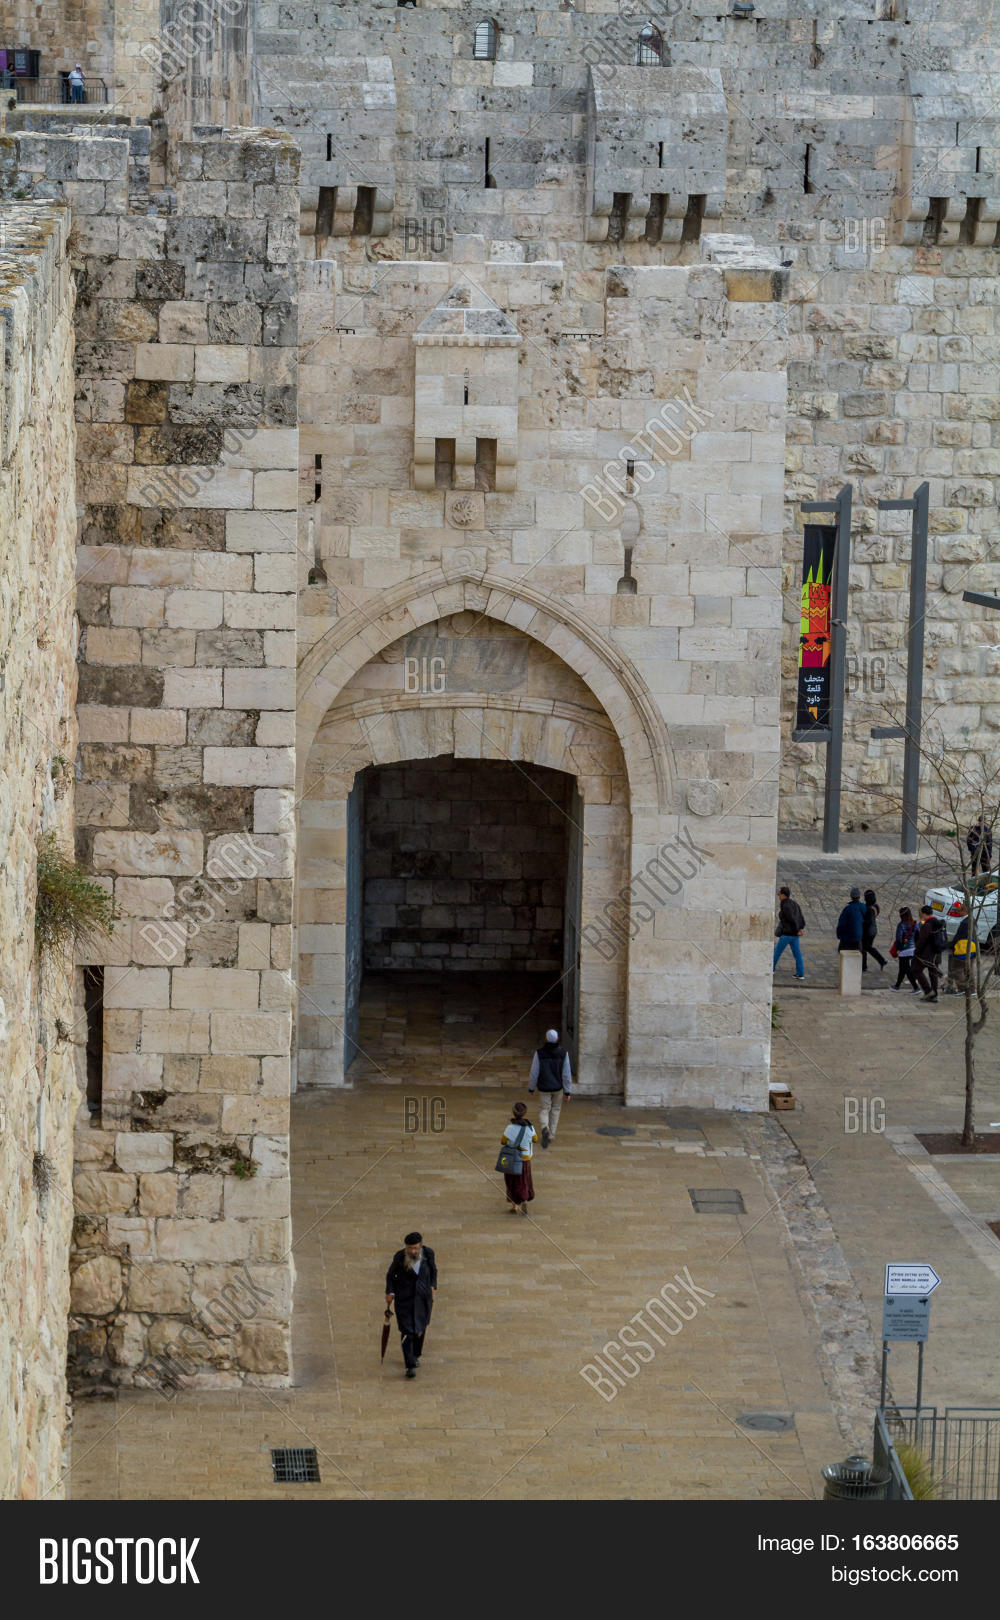 JERUSALEM ISRAEL - Image & Photo (Free Trial) | Bigstock